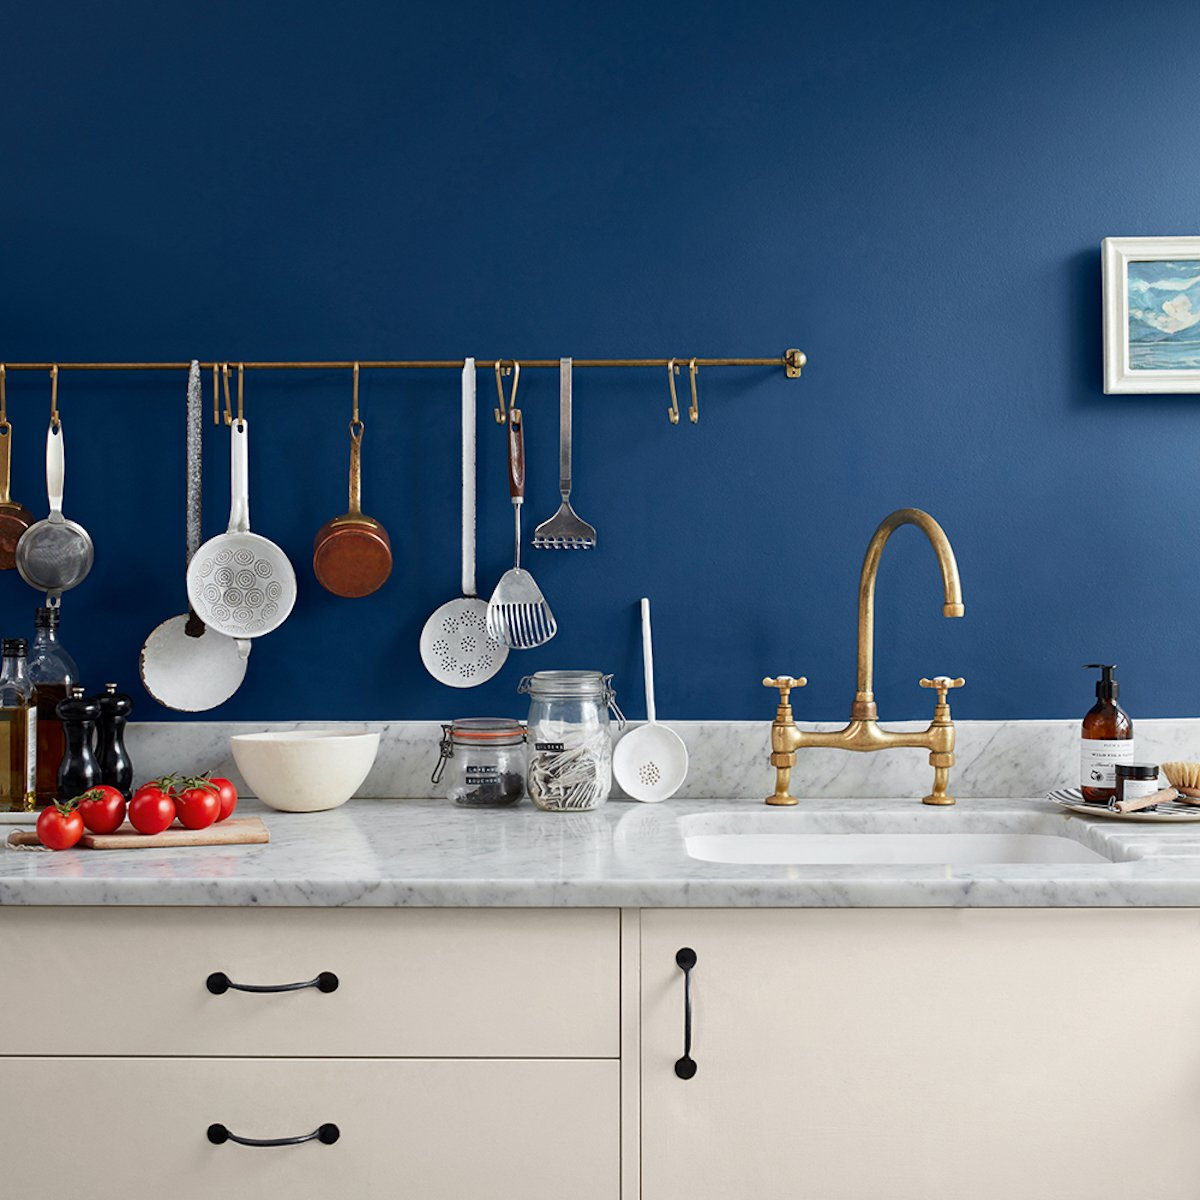 cucina-pareti-color-cobalto-10